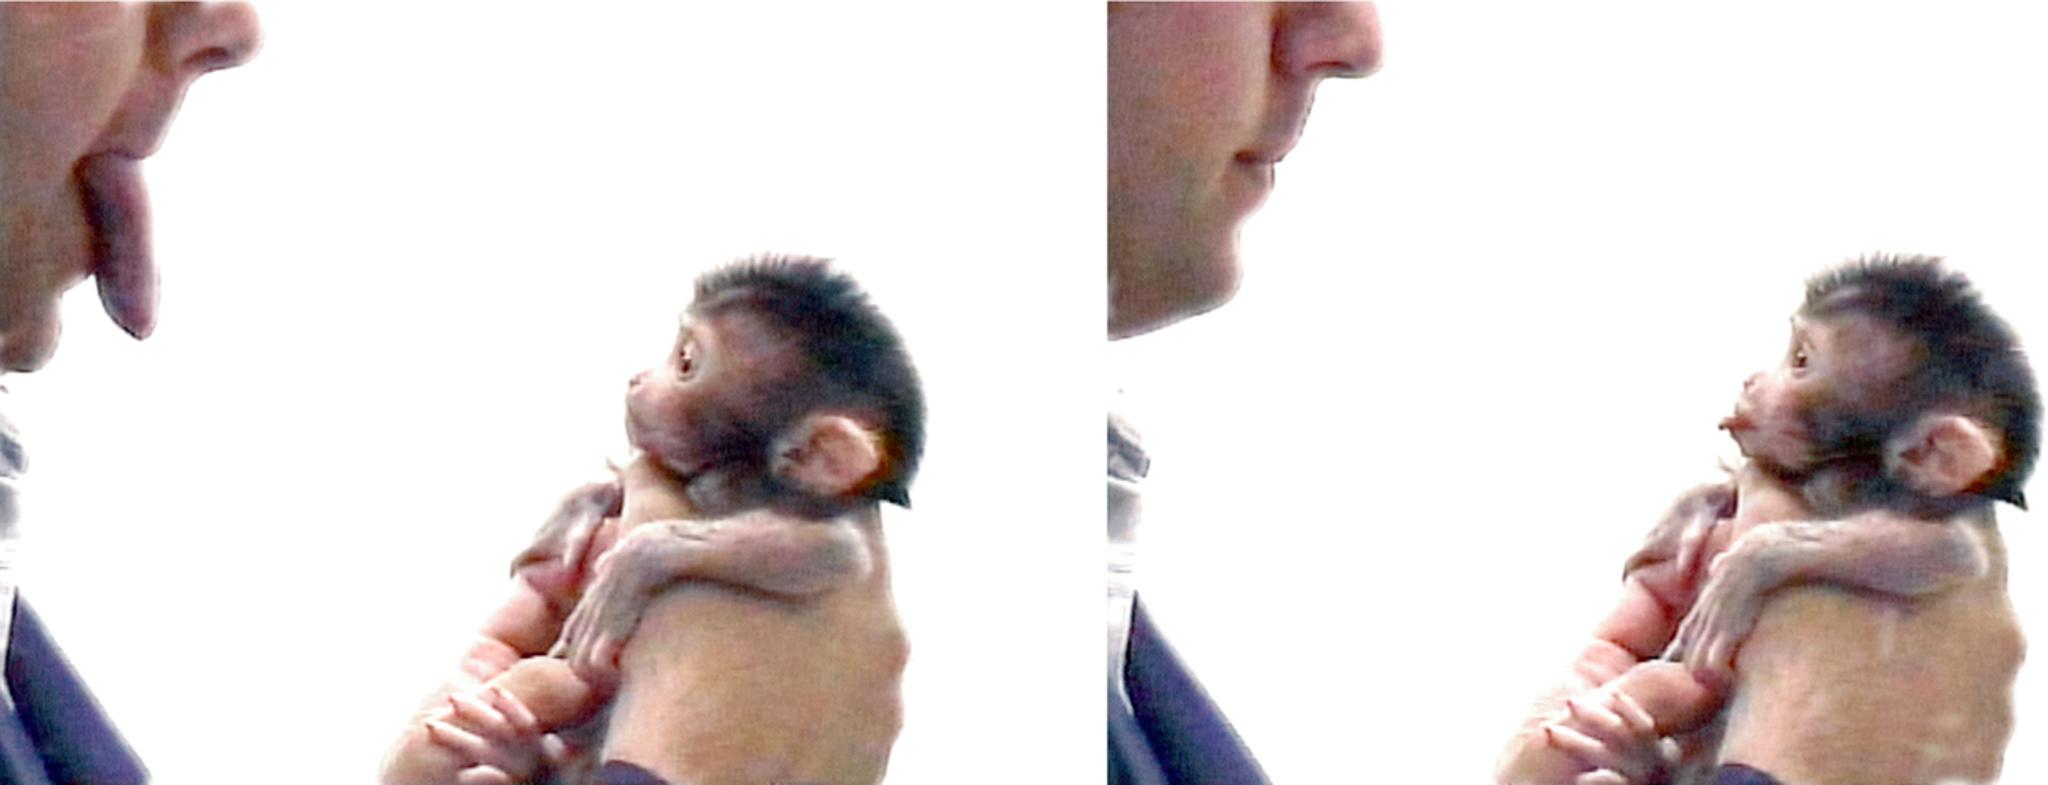 Makak neonatal imitation